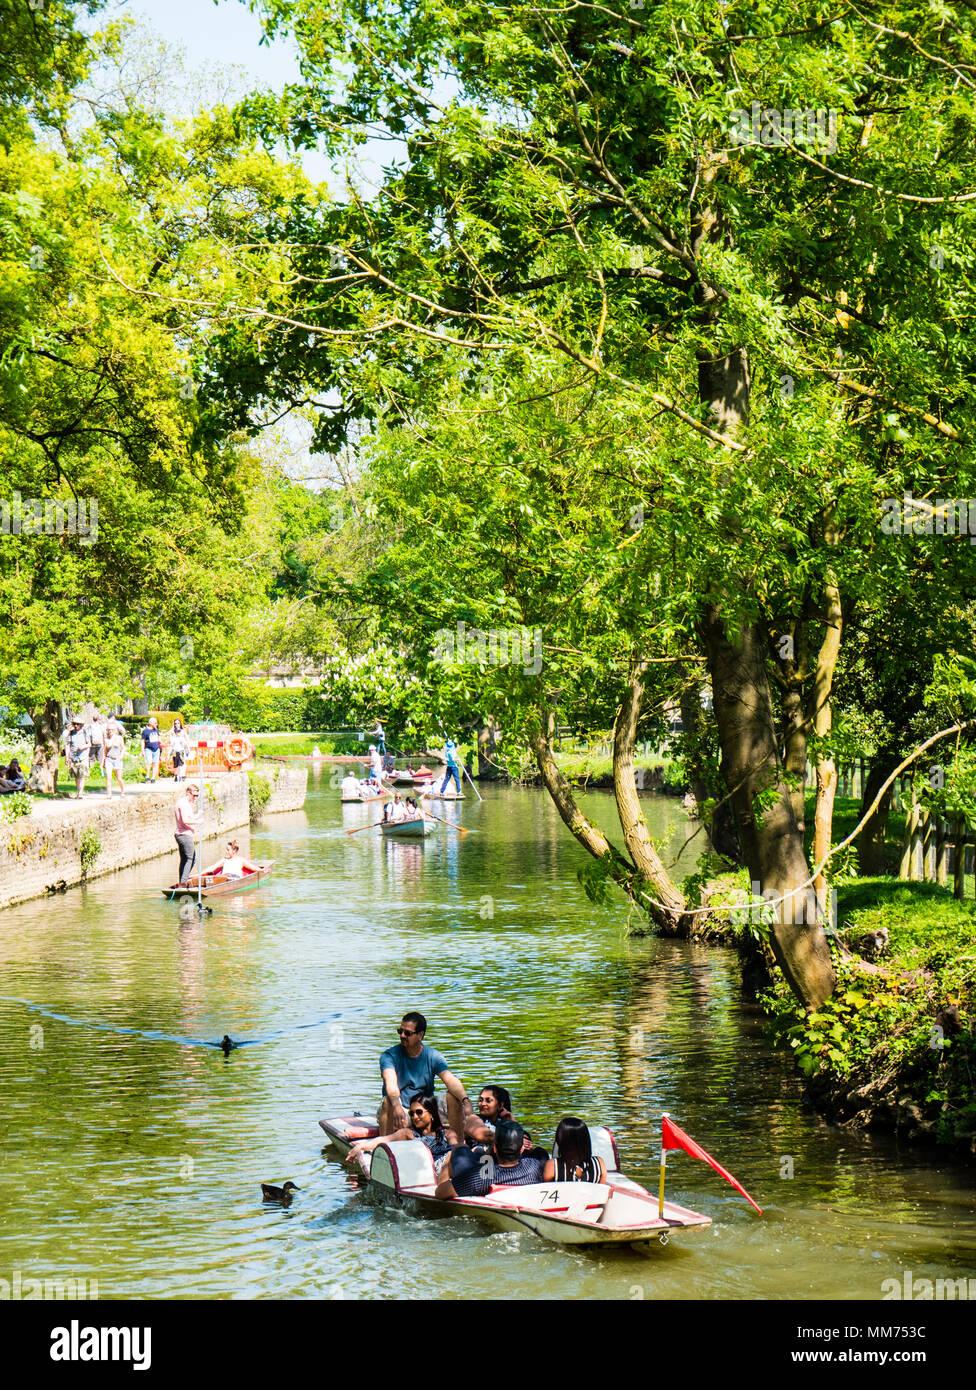 Punting, River Cherwell, Christchurch Meadow Walk, Christ Church, Oxford, England, UK, GB. - Stock Image